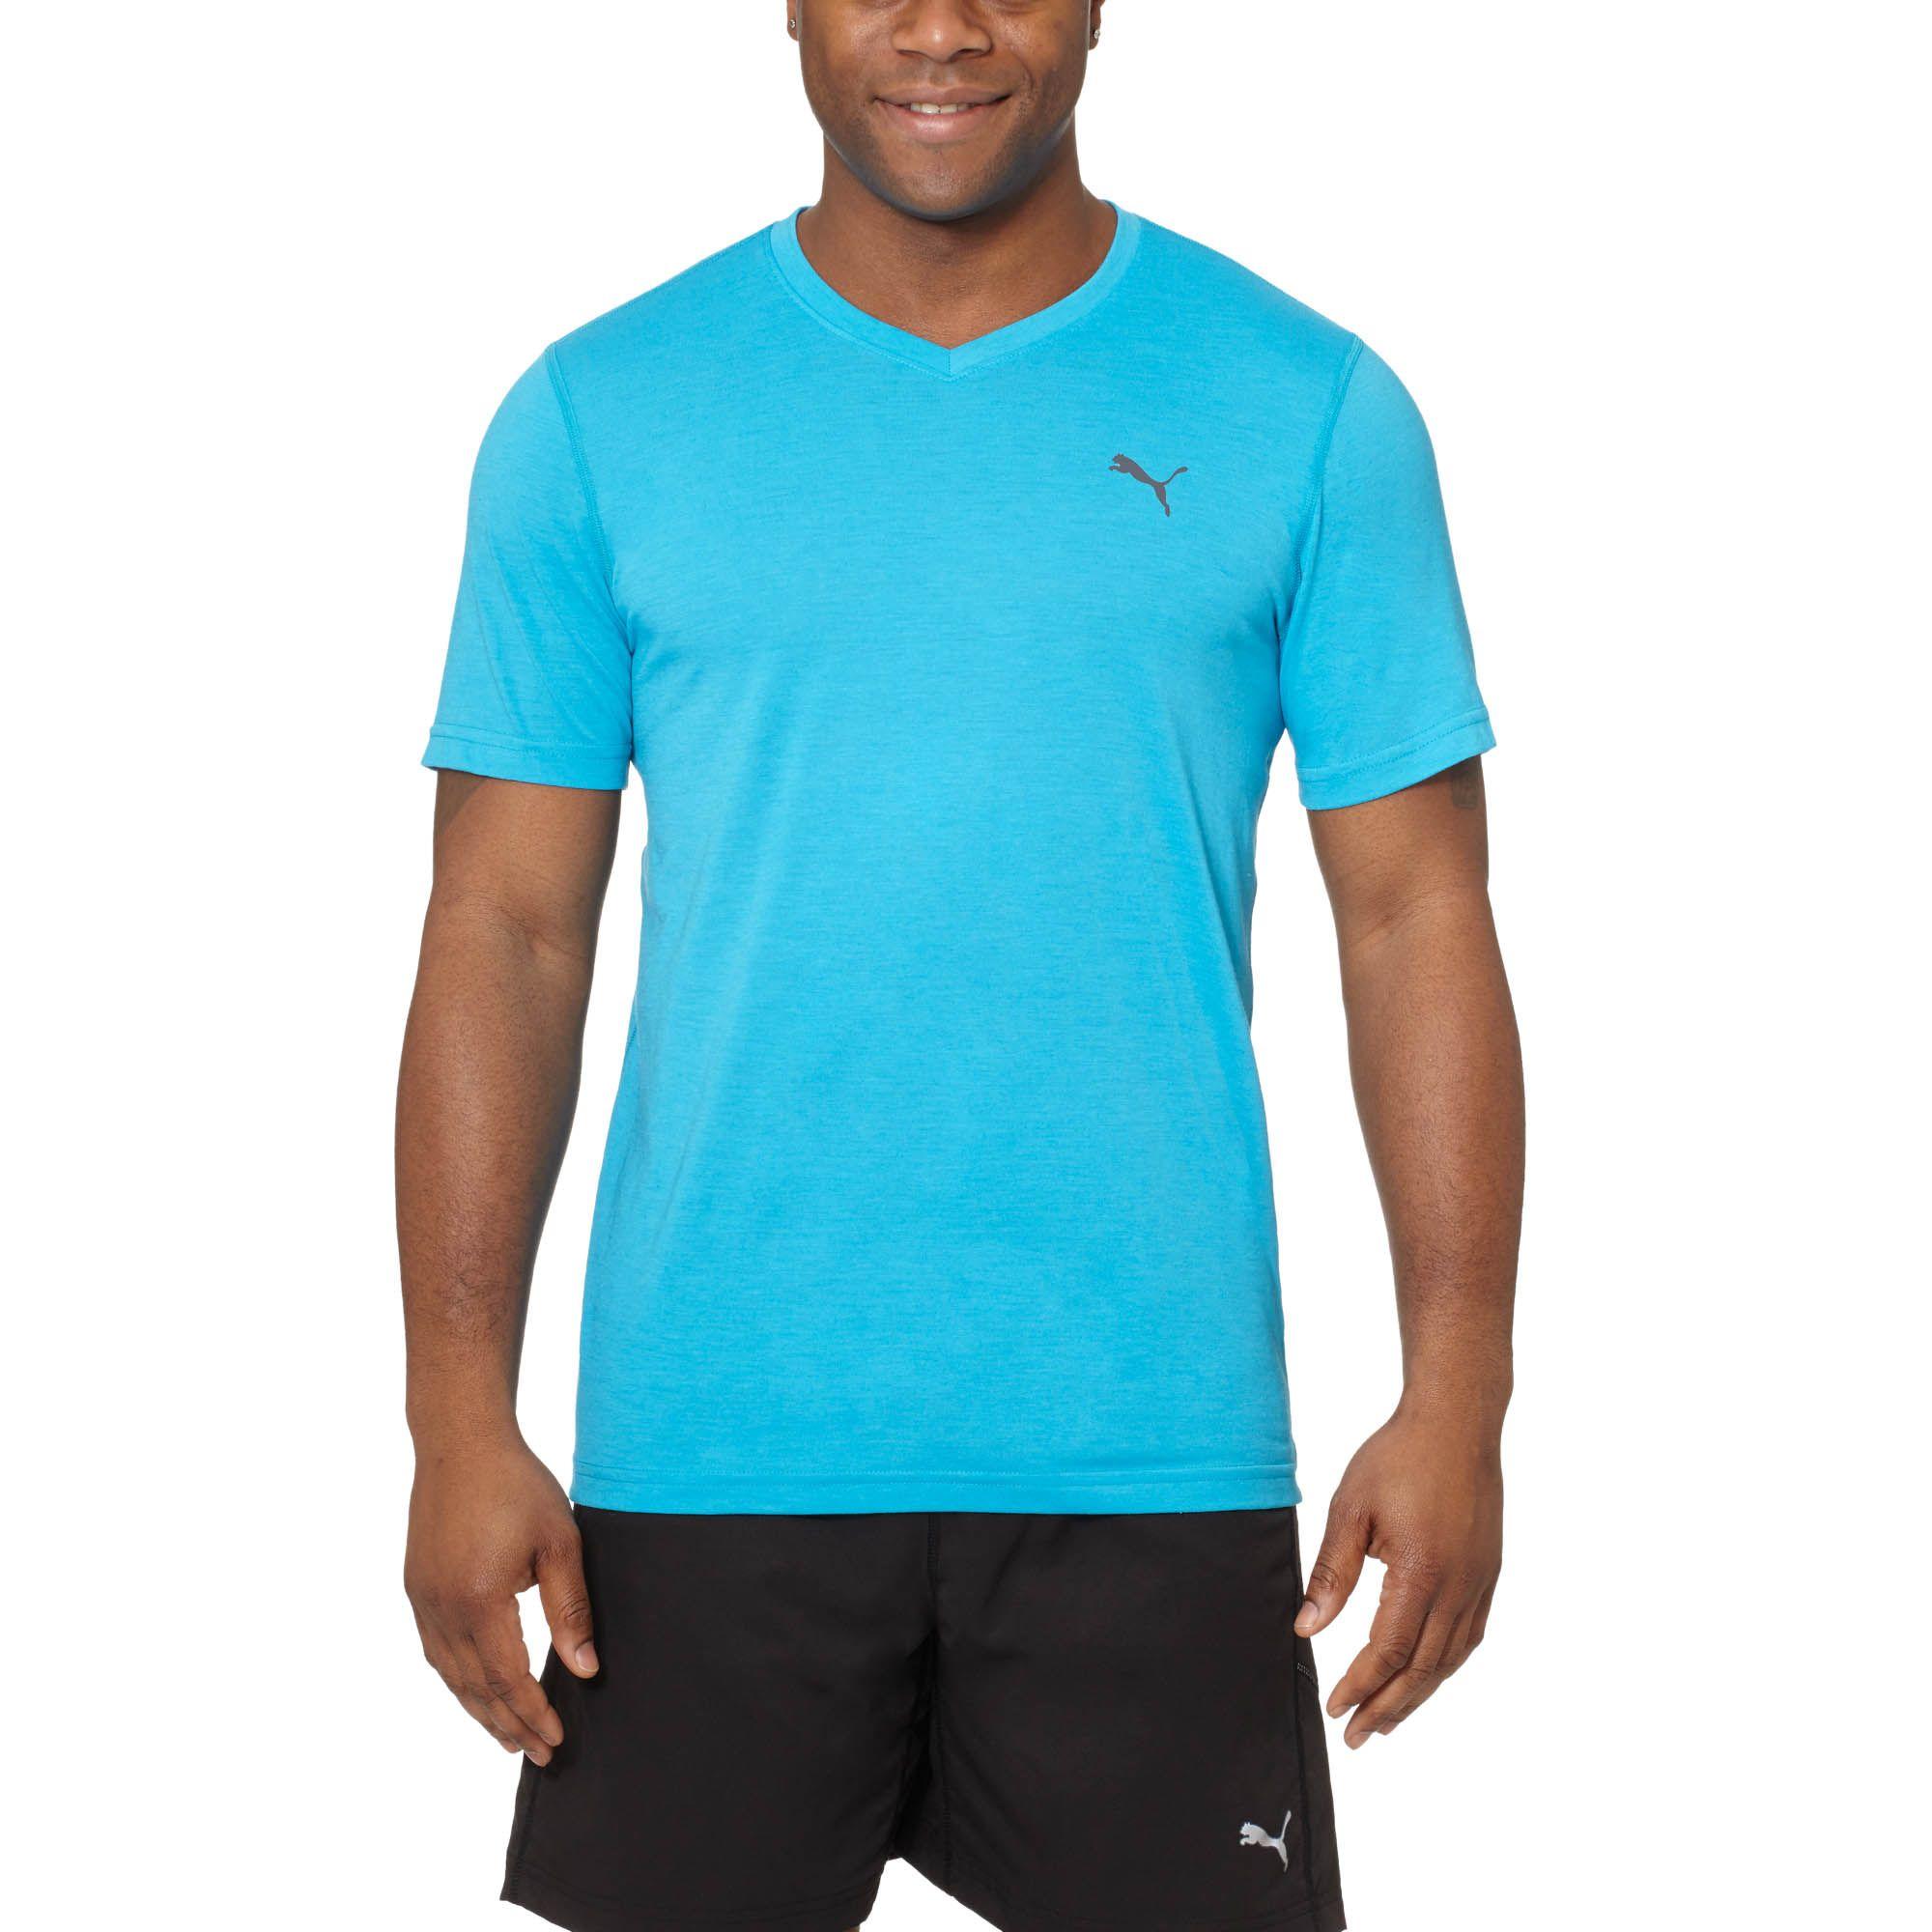 Puma Essential V Neck T Shirt In Blue For Men Lyst